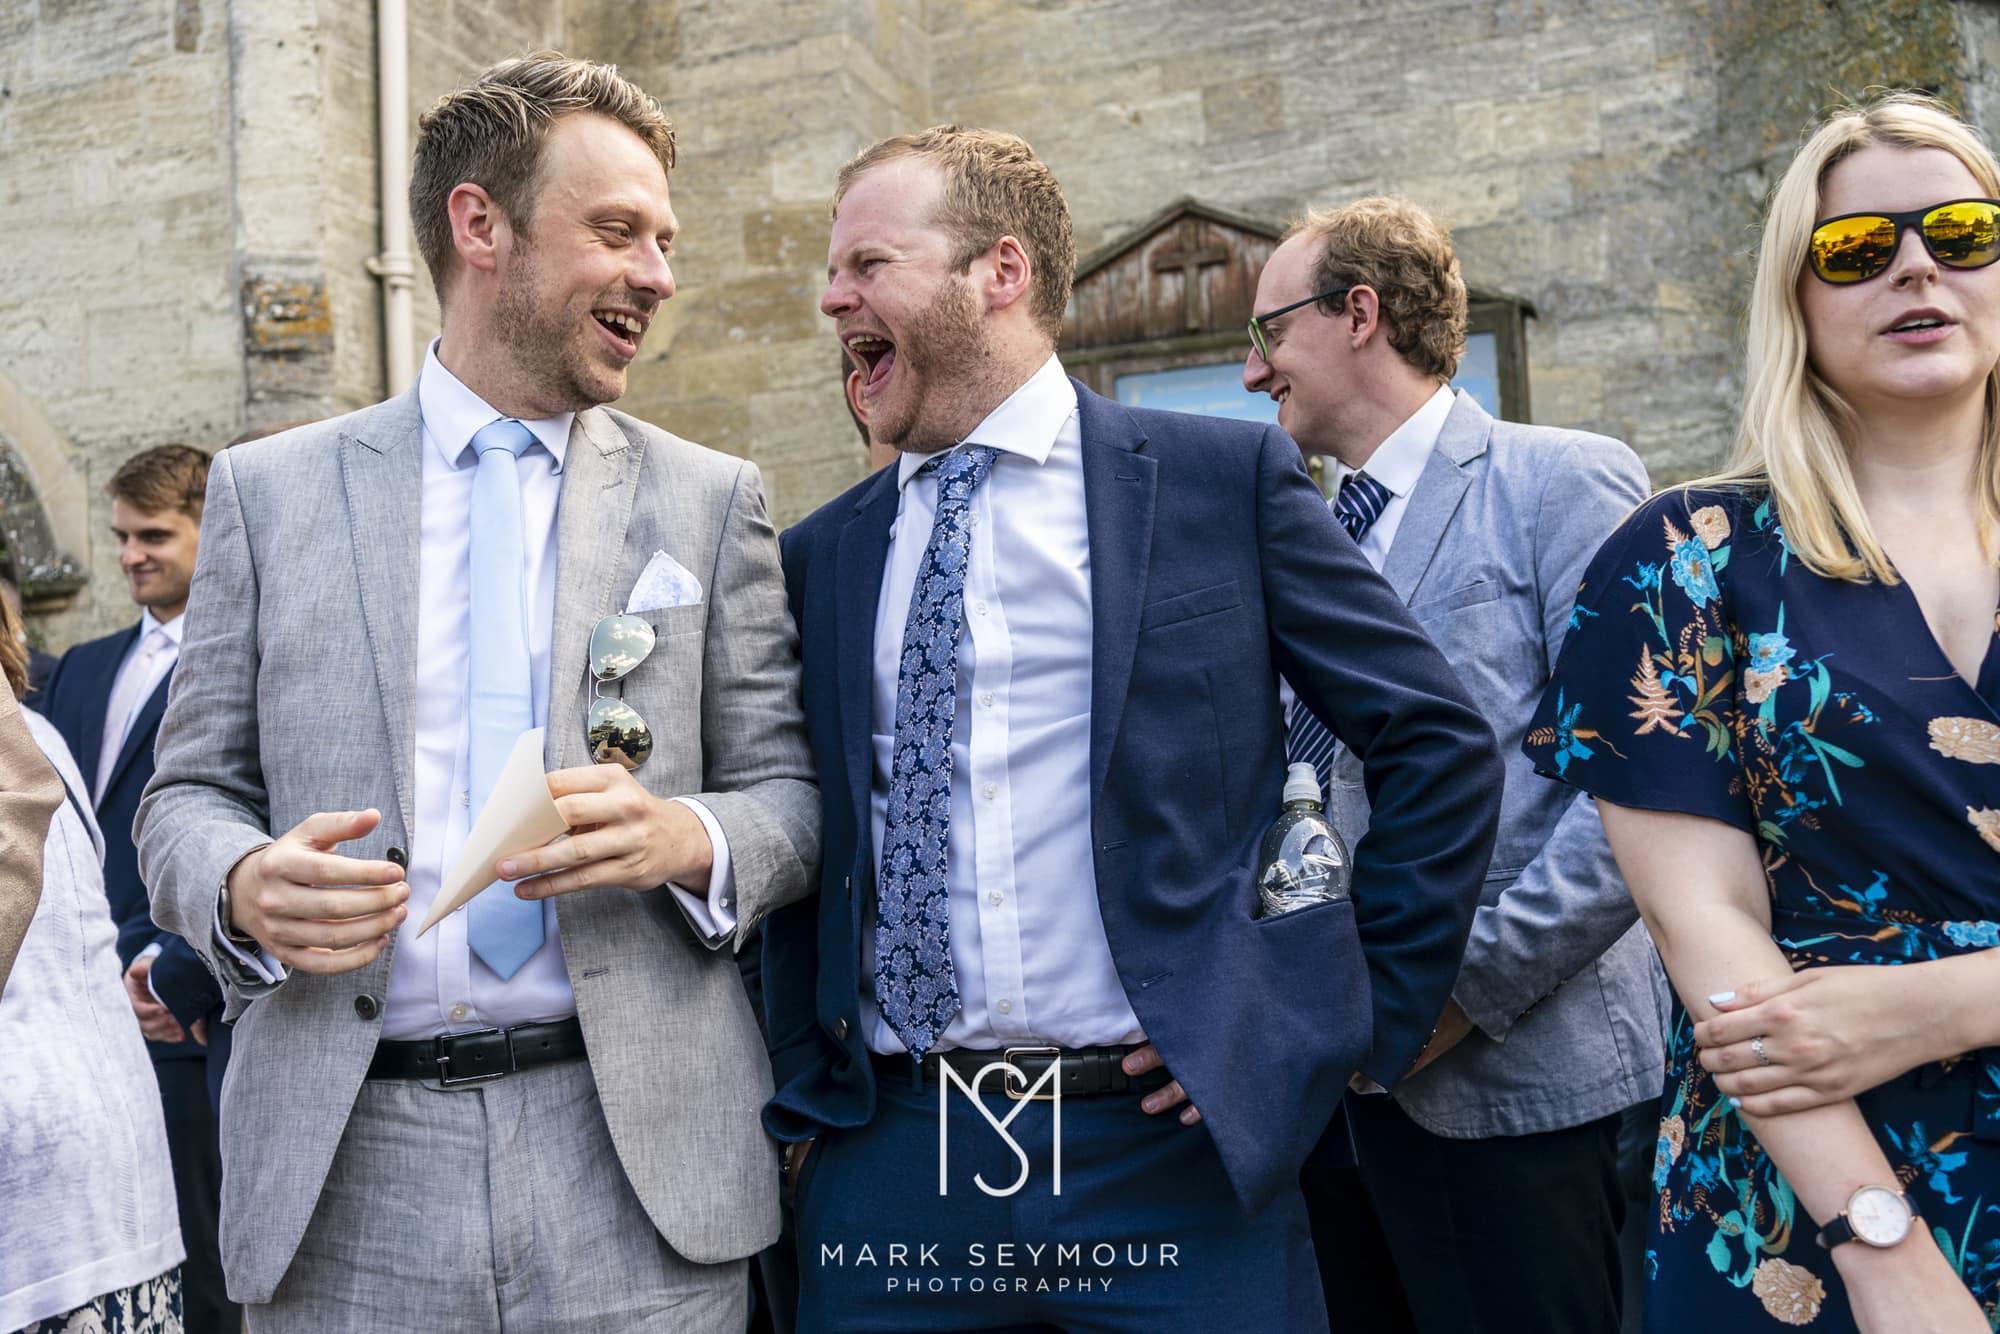 Barnsley House Wedding Photographer - Olivia and James' wedding 9